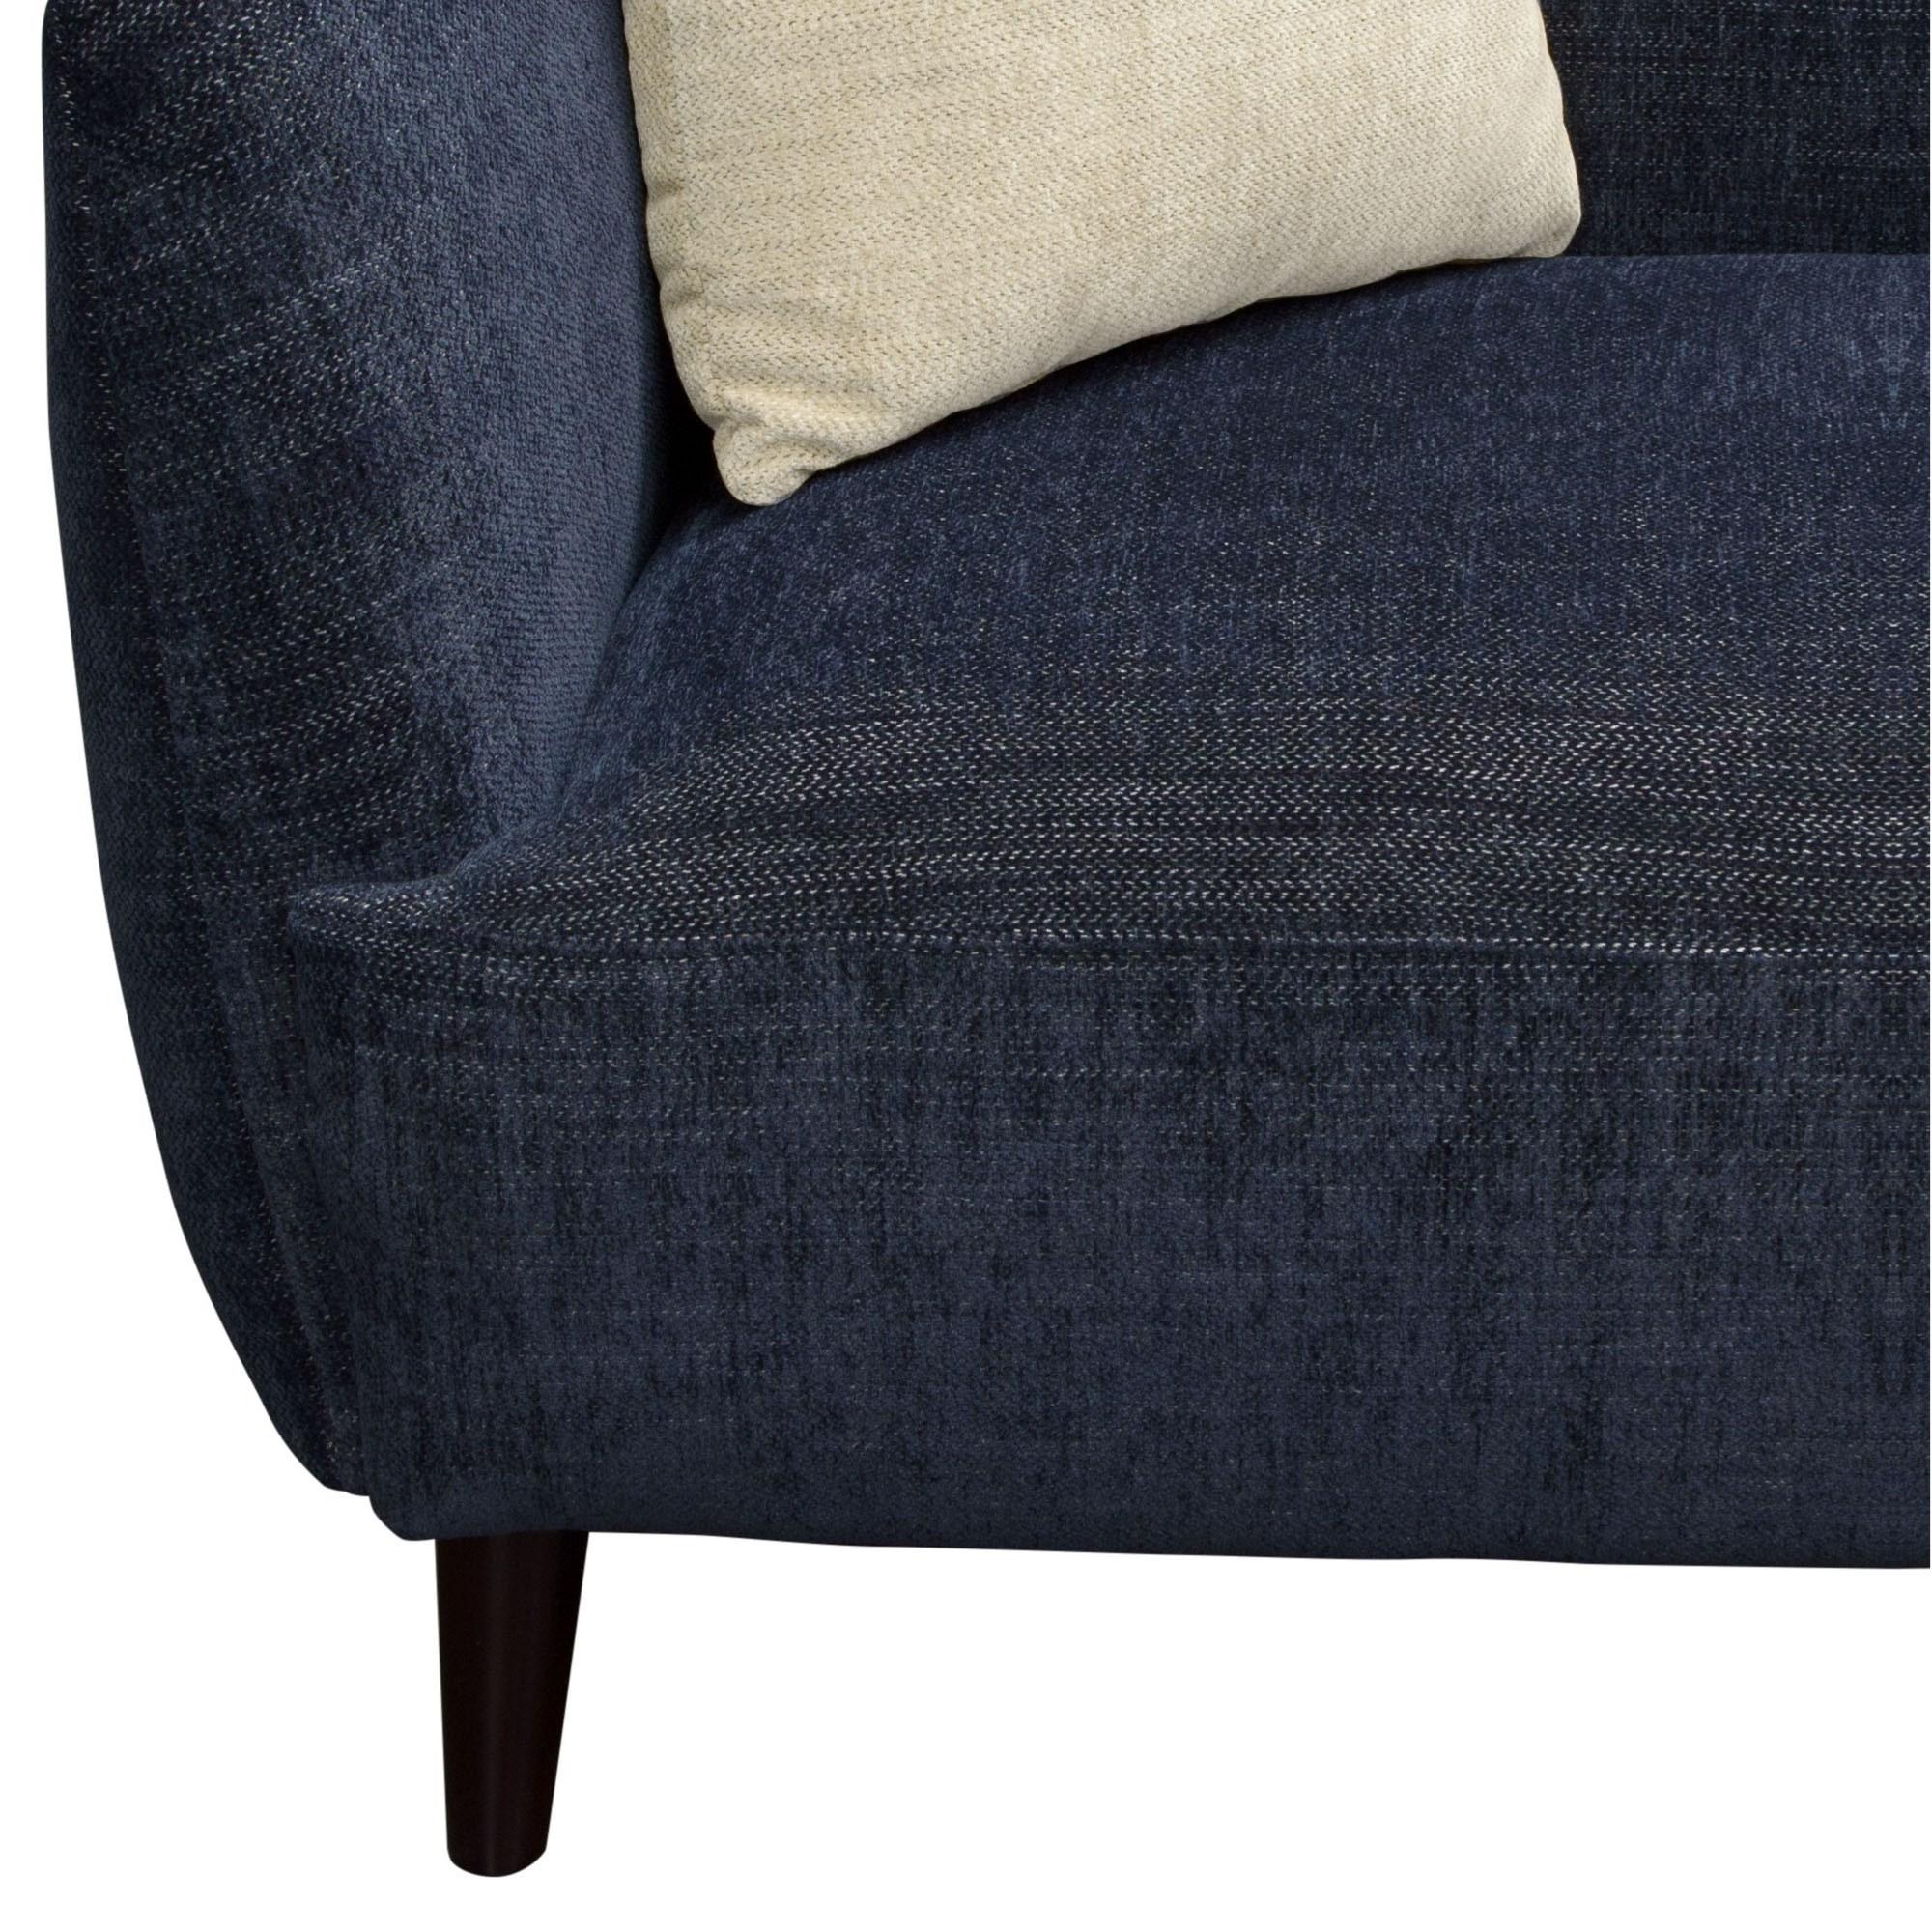 angled sofa legs ashley power recliner leather diamond de luca delucalobu modern loveseat with